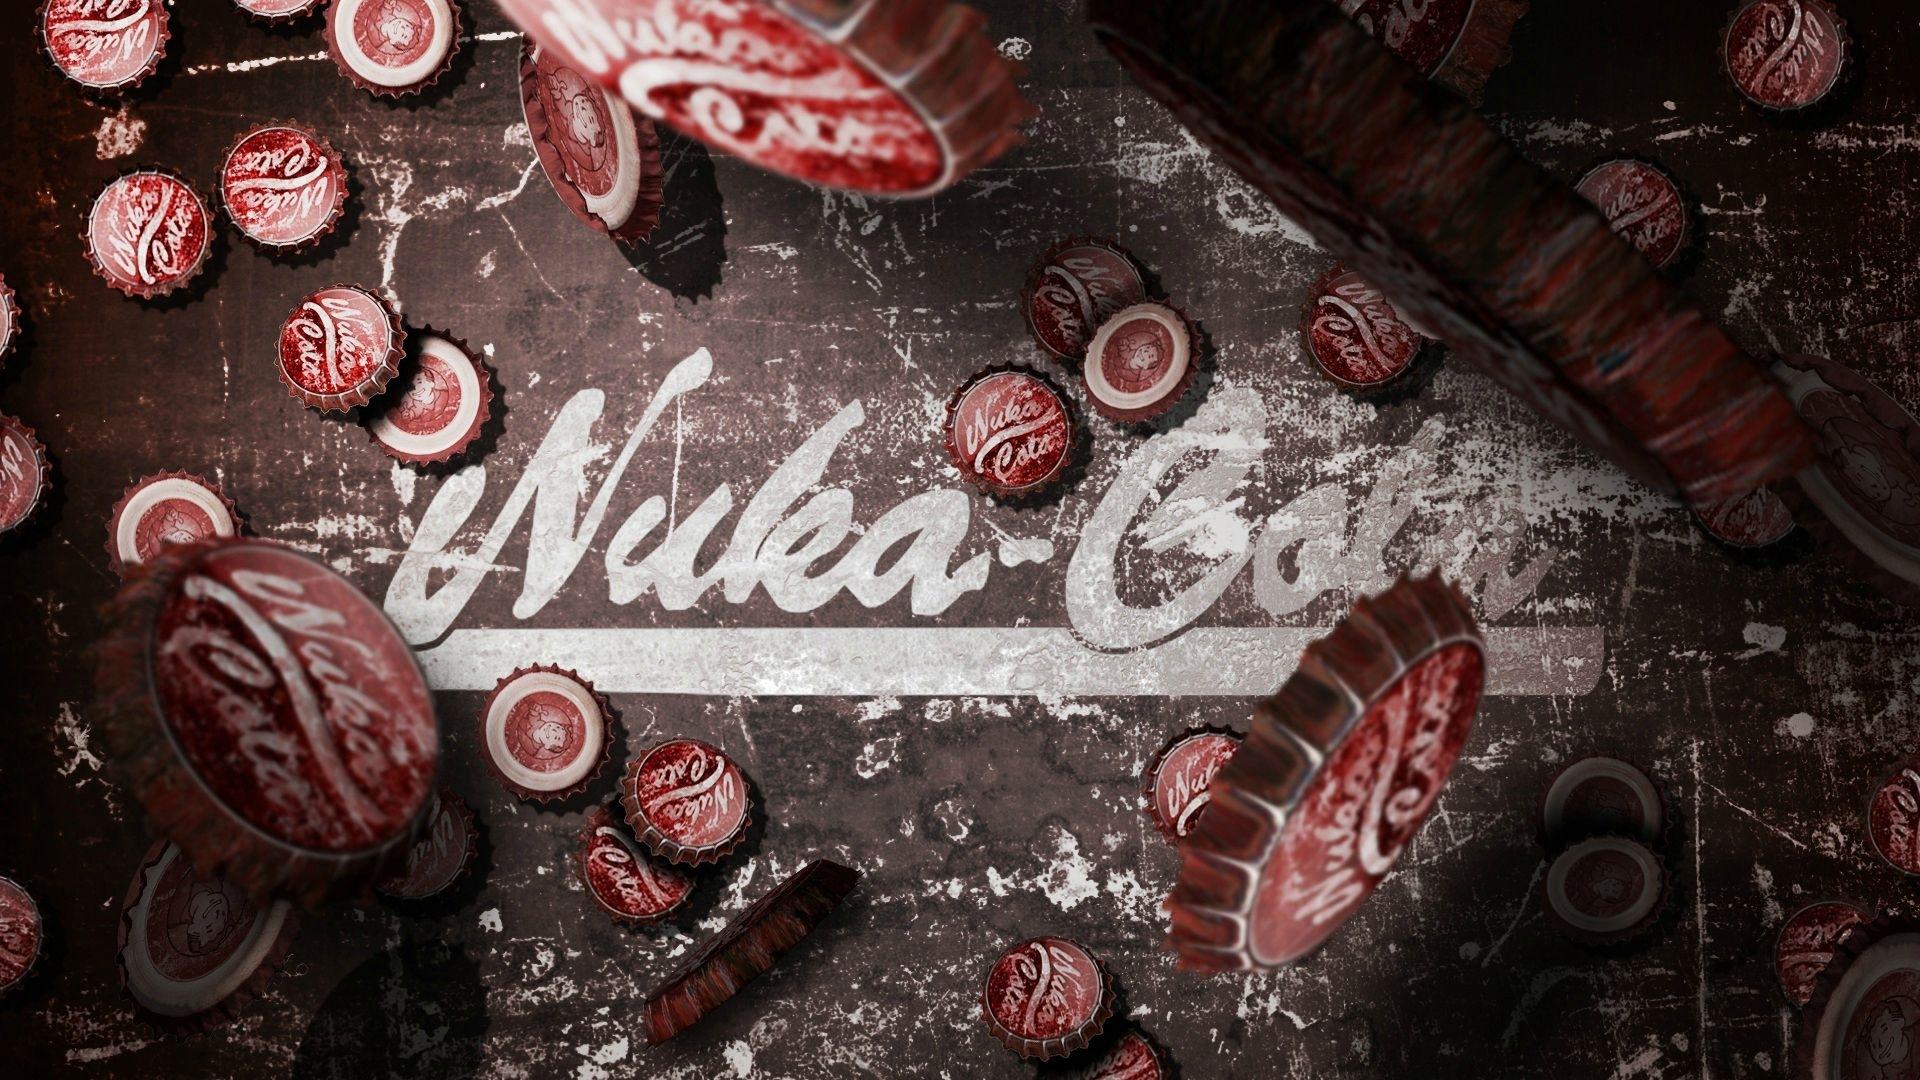 nuka-cola wallpaper : fallout